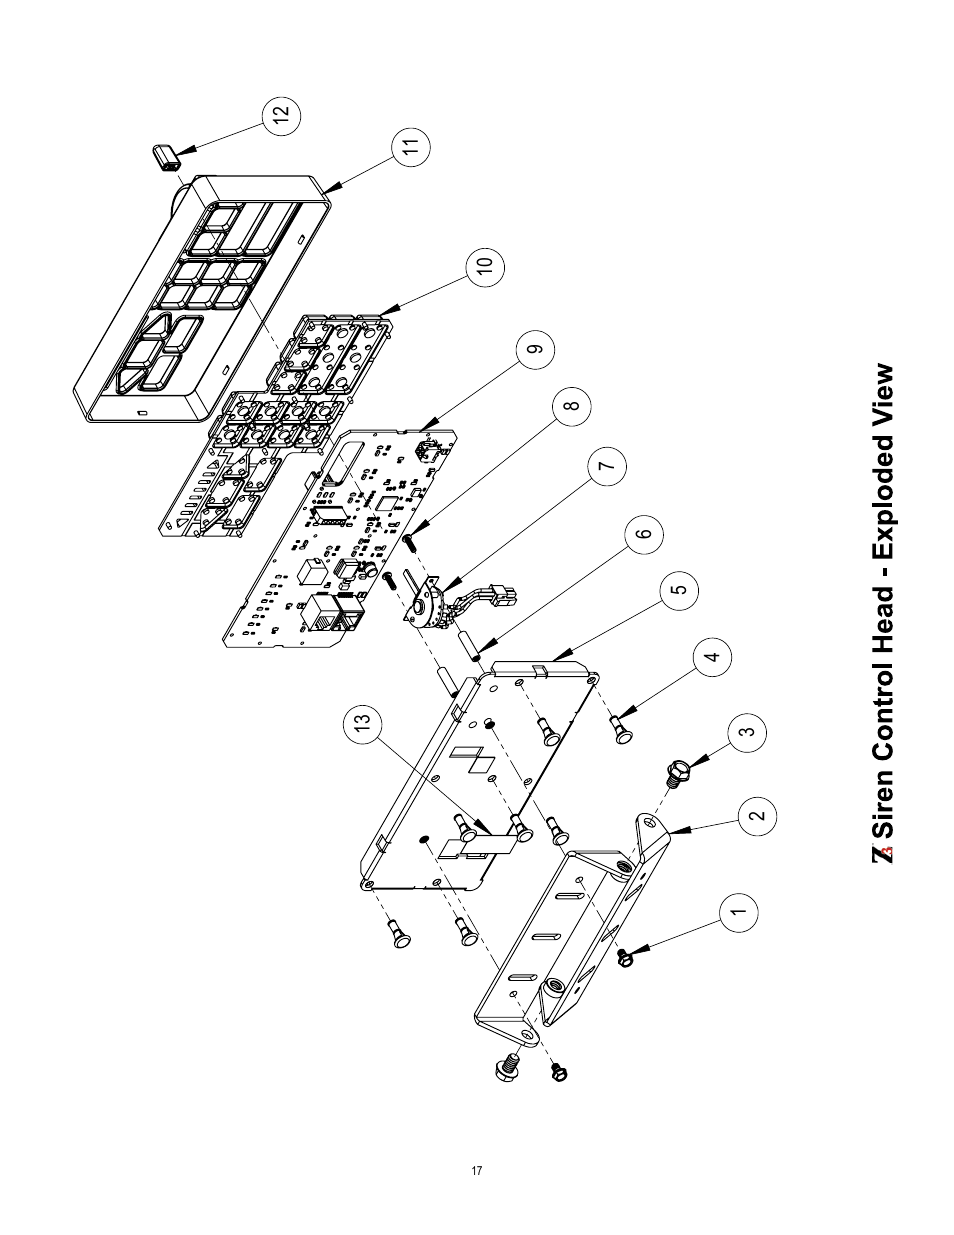 Code 3 Z3 Siren Installation & Operation Manual User